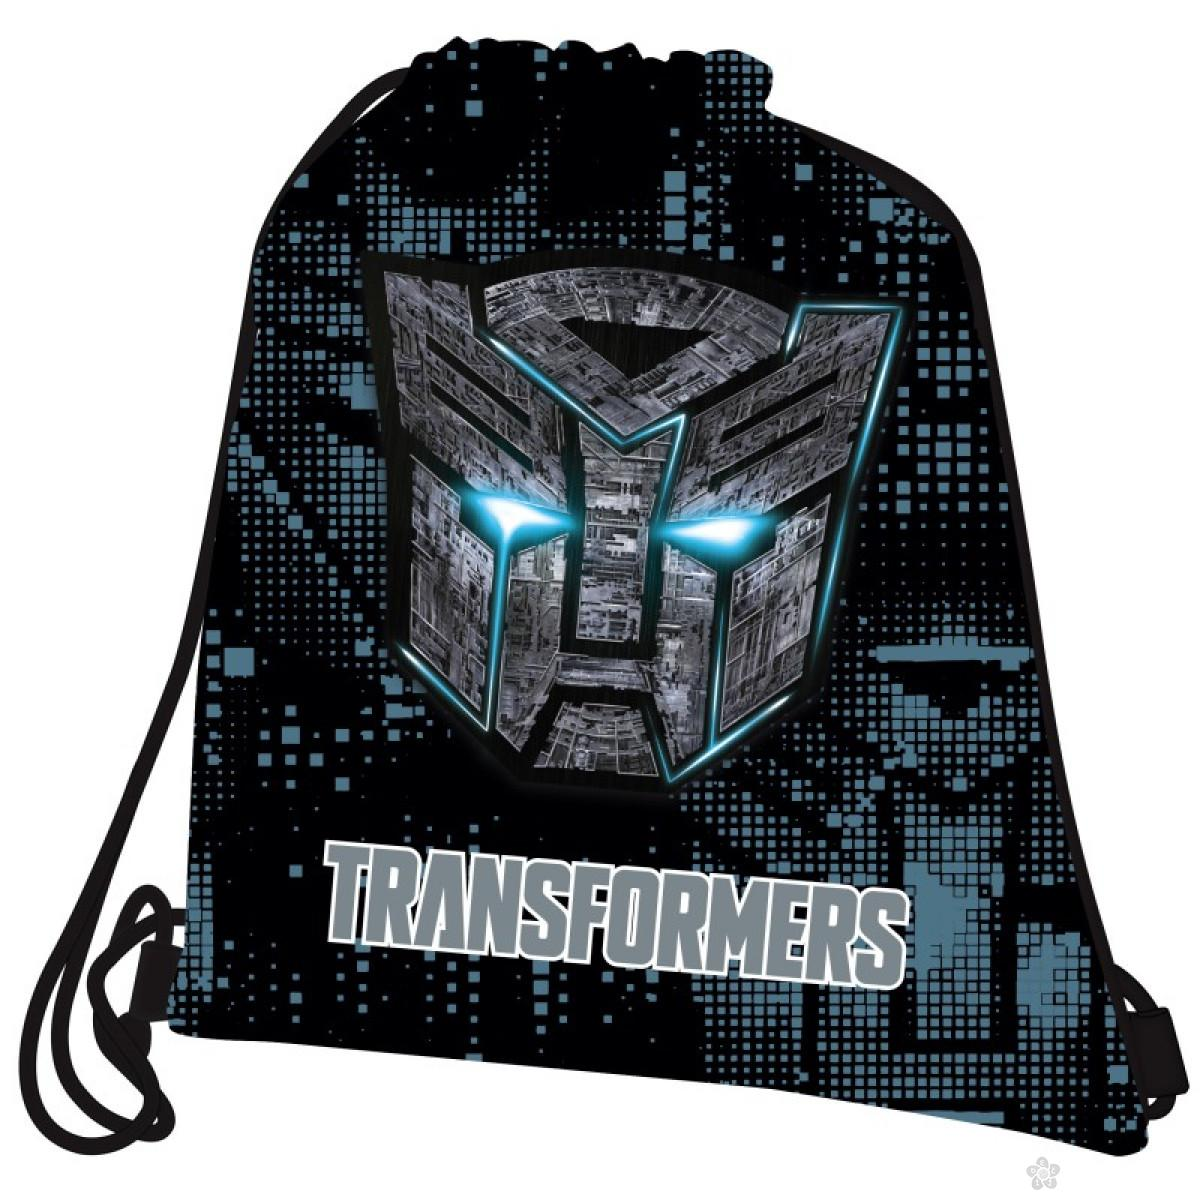 Torba za patike Target Transformers 22021